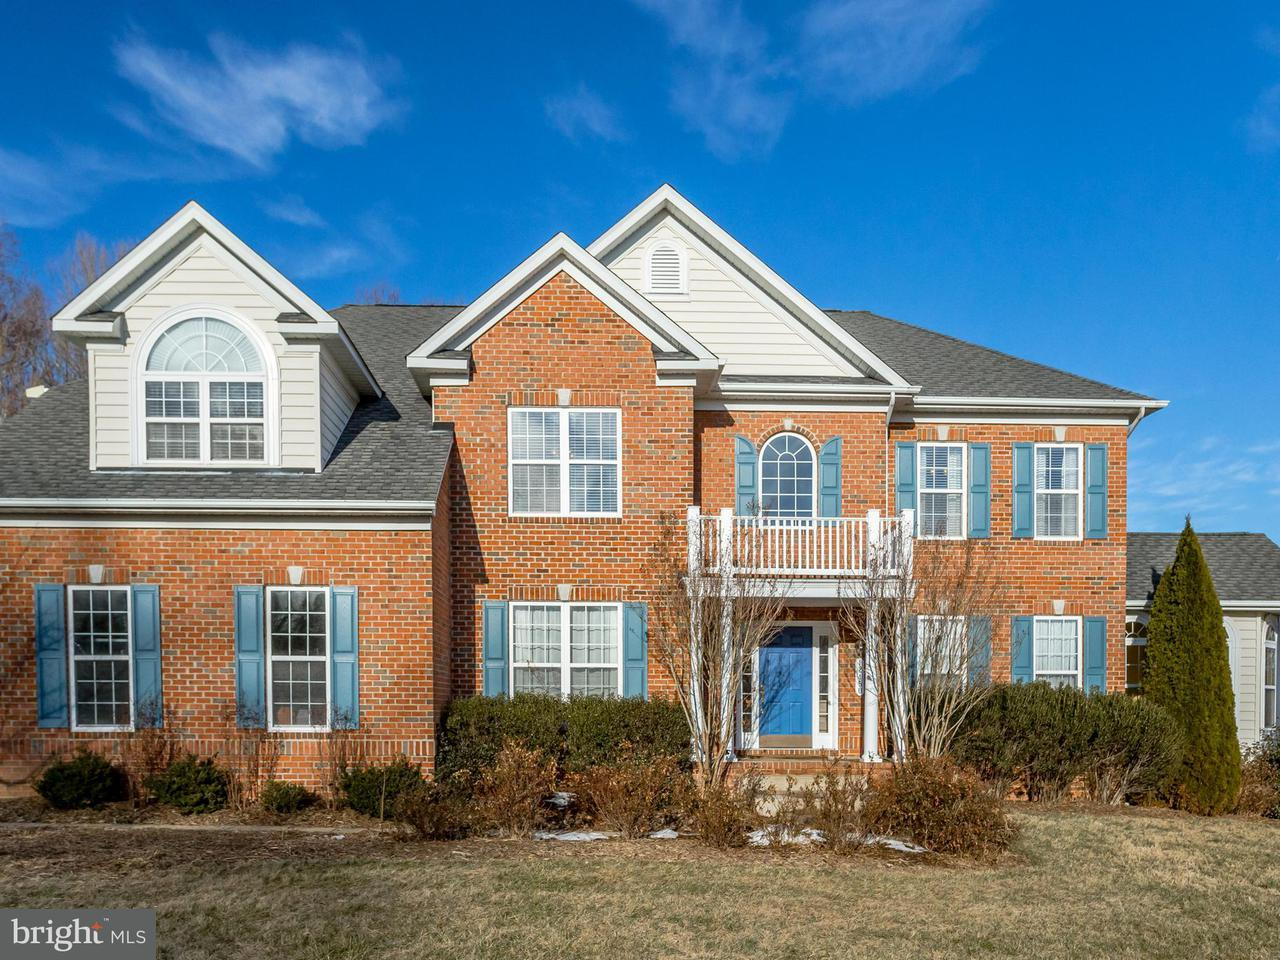 獨棟家庭住宅 為 出售 在 12450 Whisper Creek Court 12450 Whisper Creek Court Charlotte Hall, 馬里蘭州 20622 美國